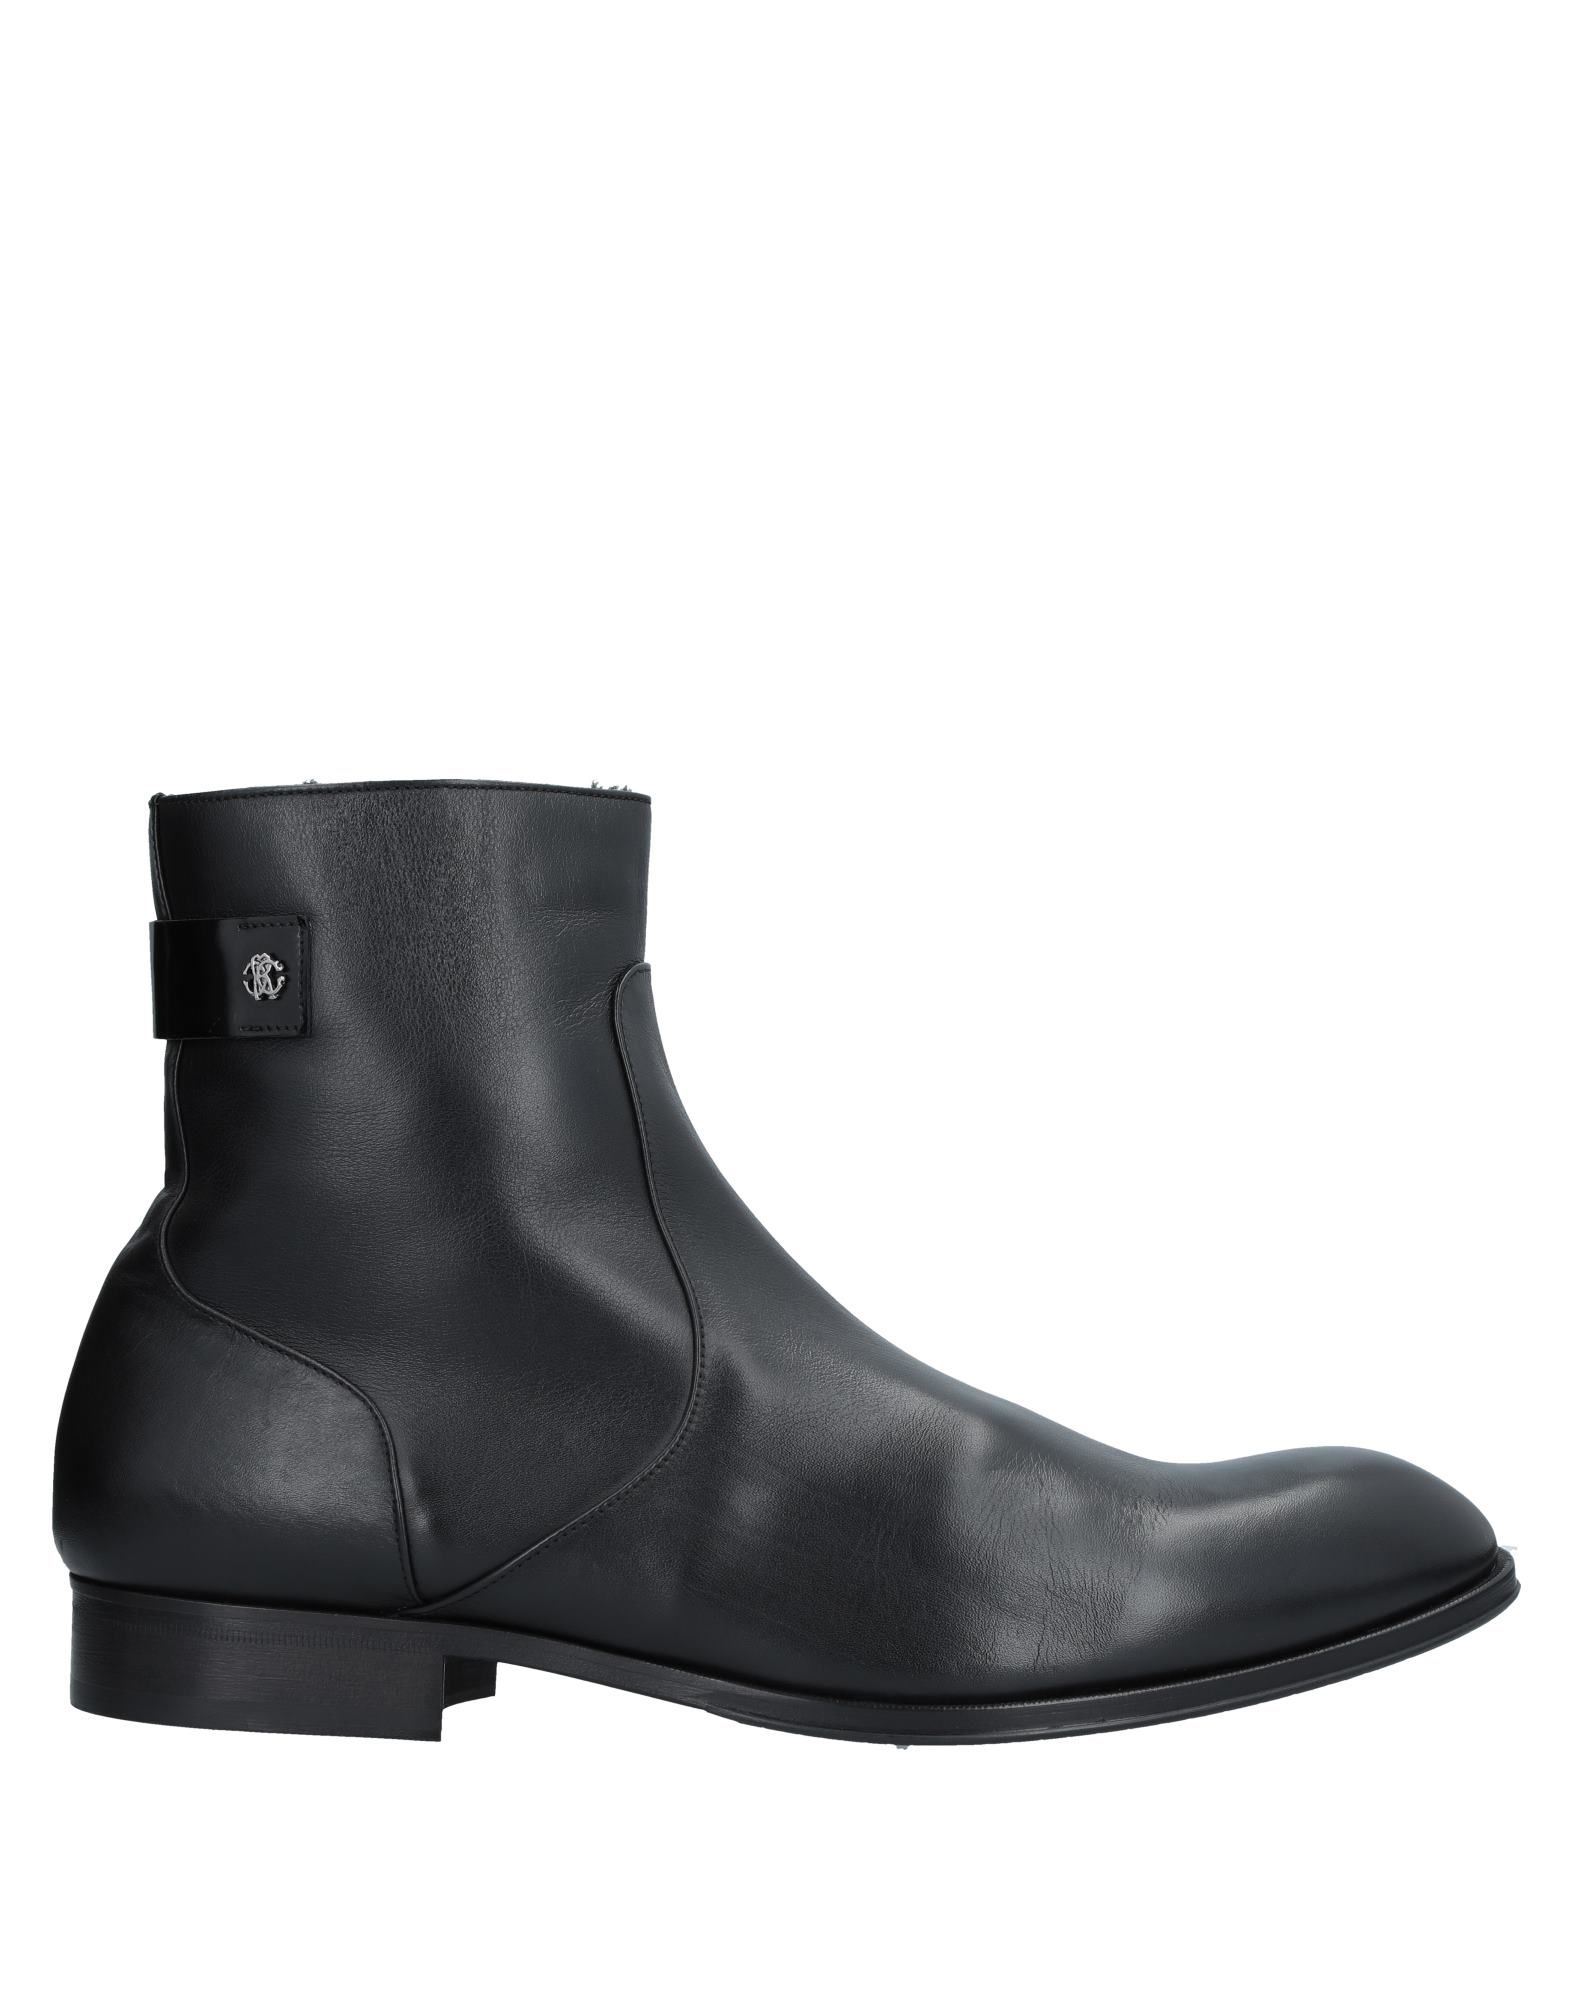 Roberto Cavalli Stiefelette Herren  11525715TV Neue Schuhe